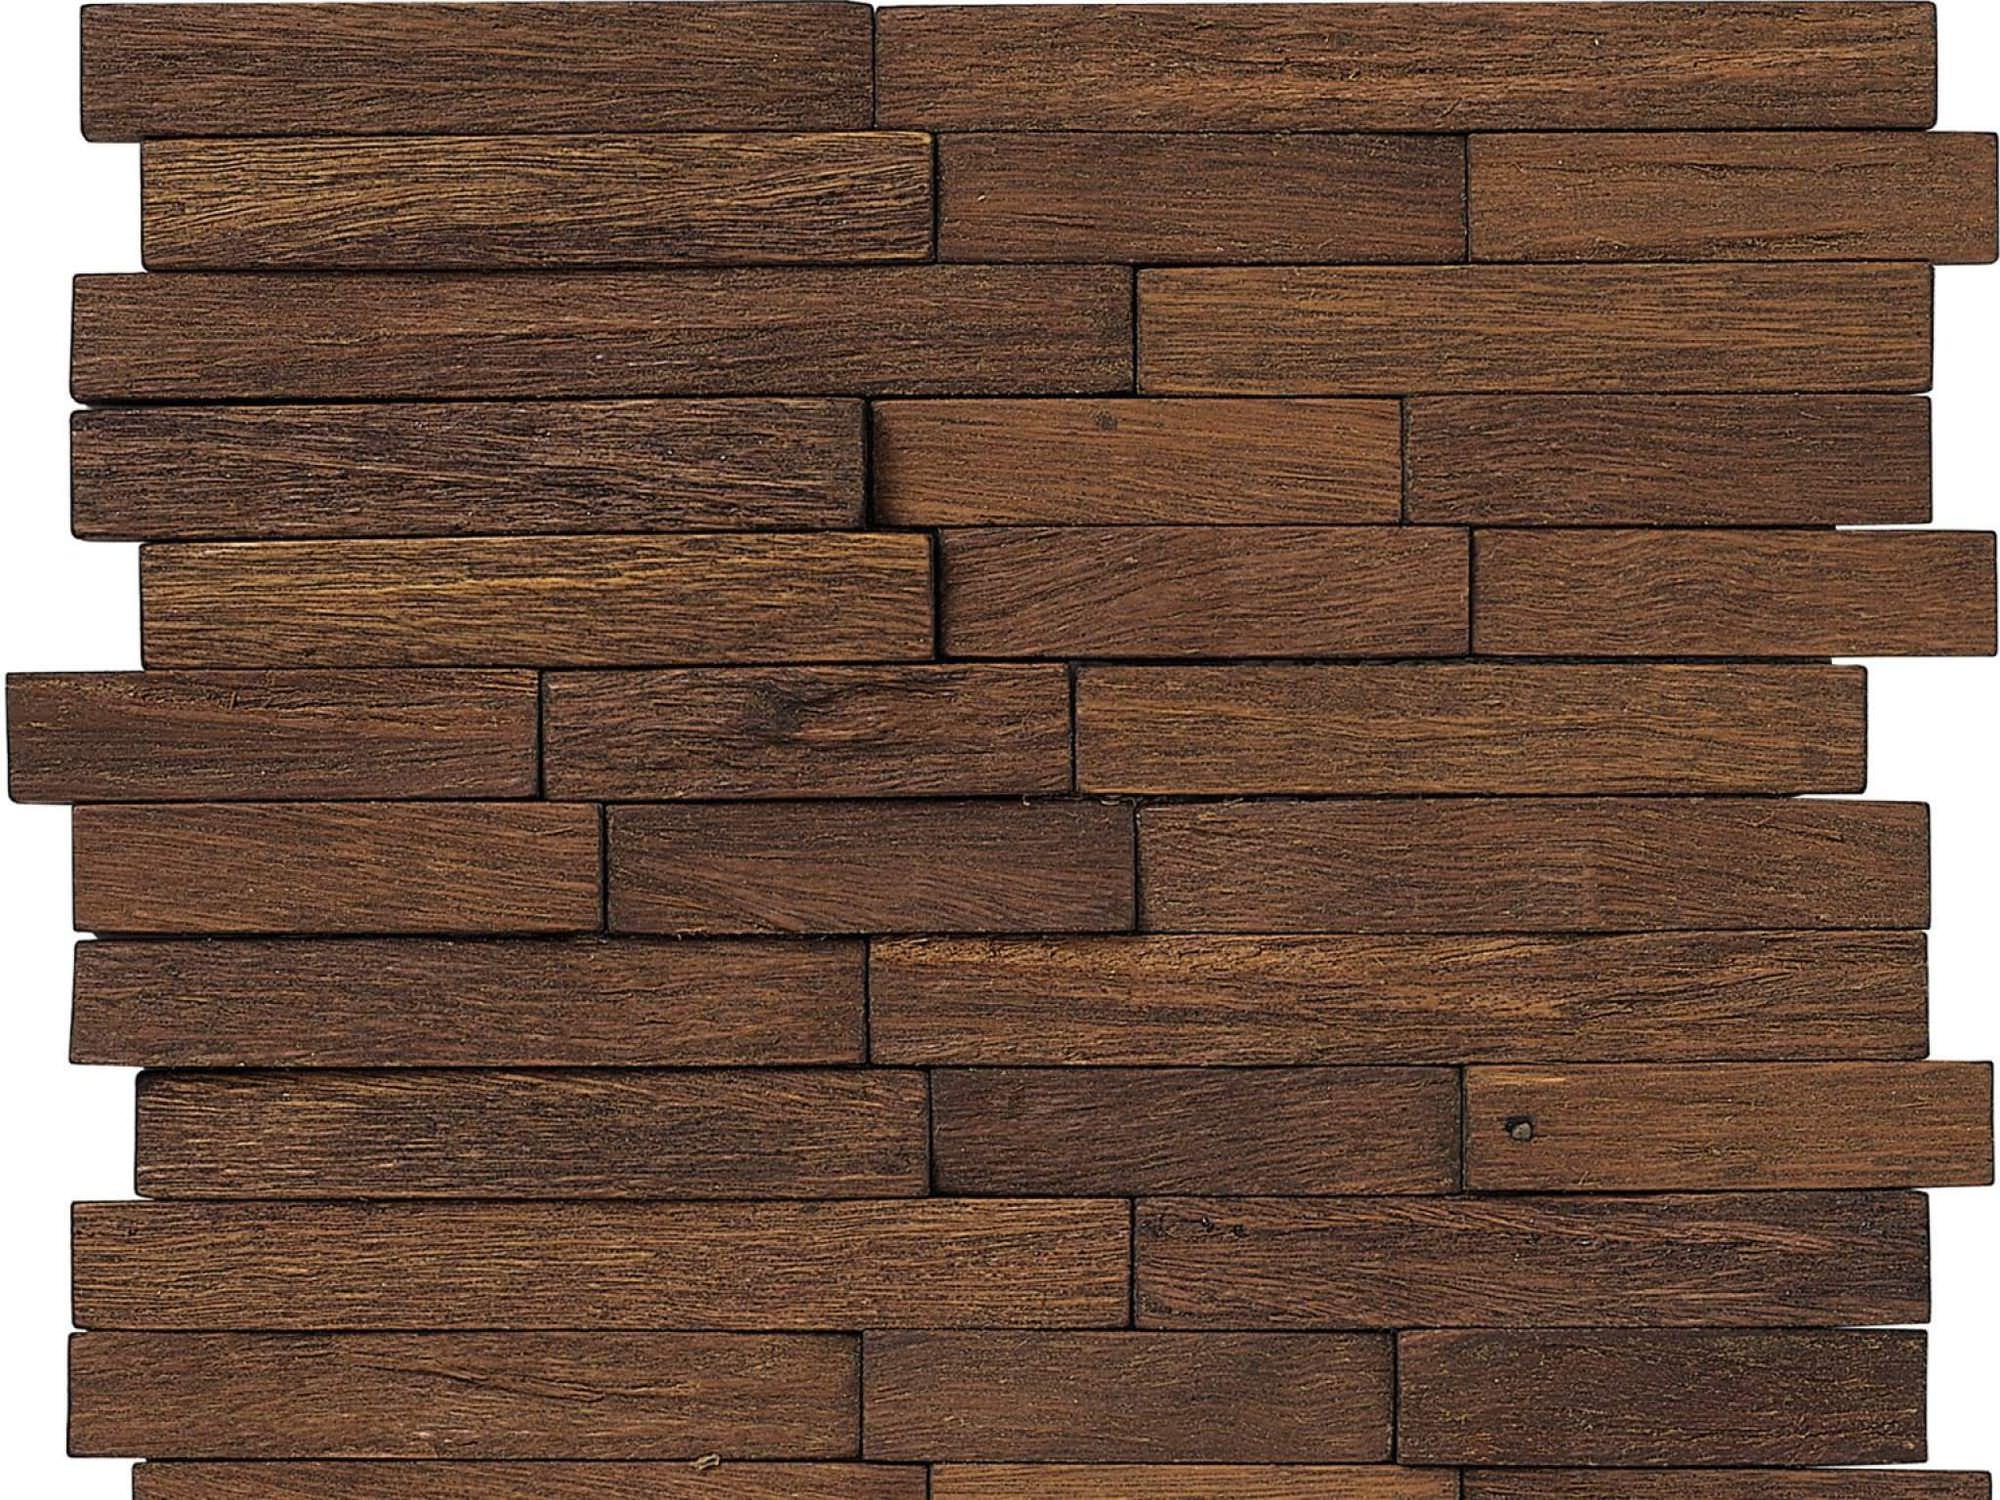 L minas decorativas dise o interior revista - Architectural wood interior wall panels ...